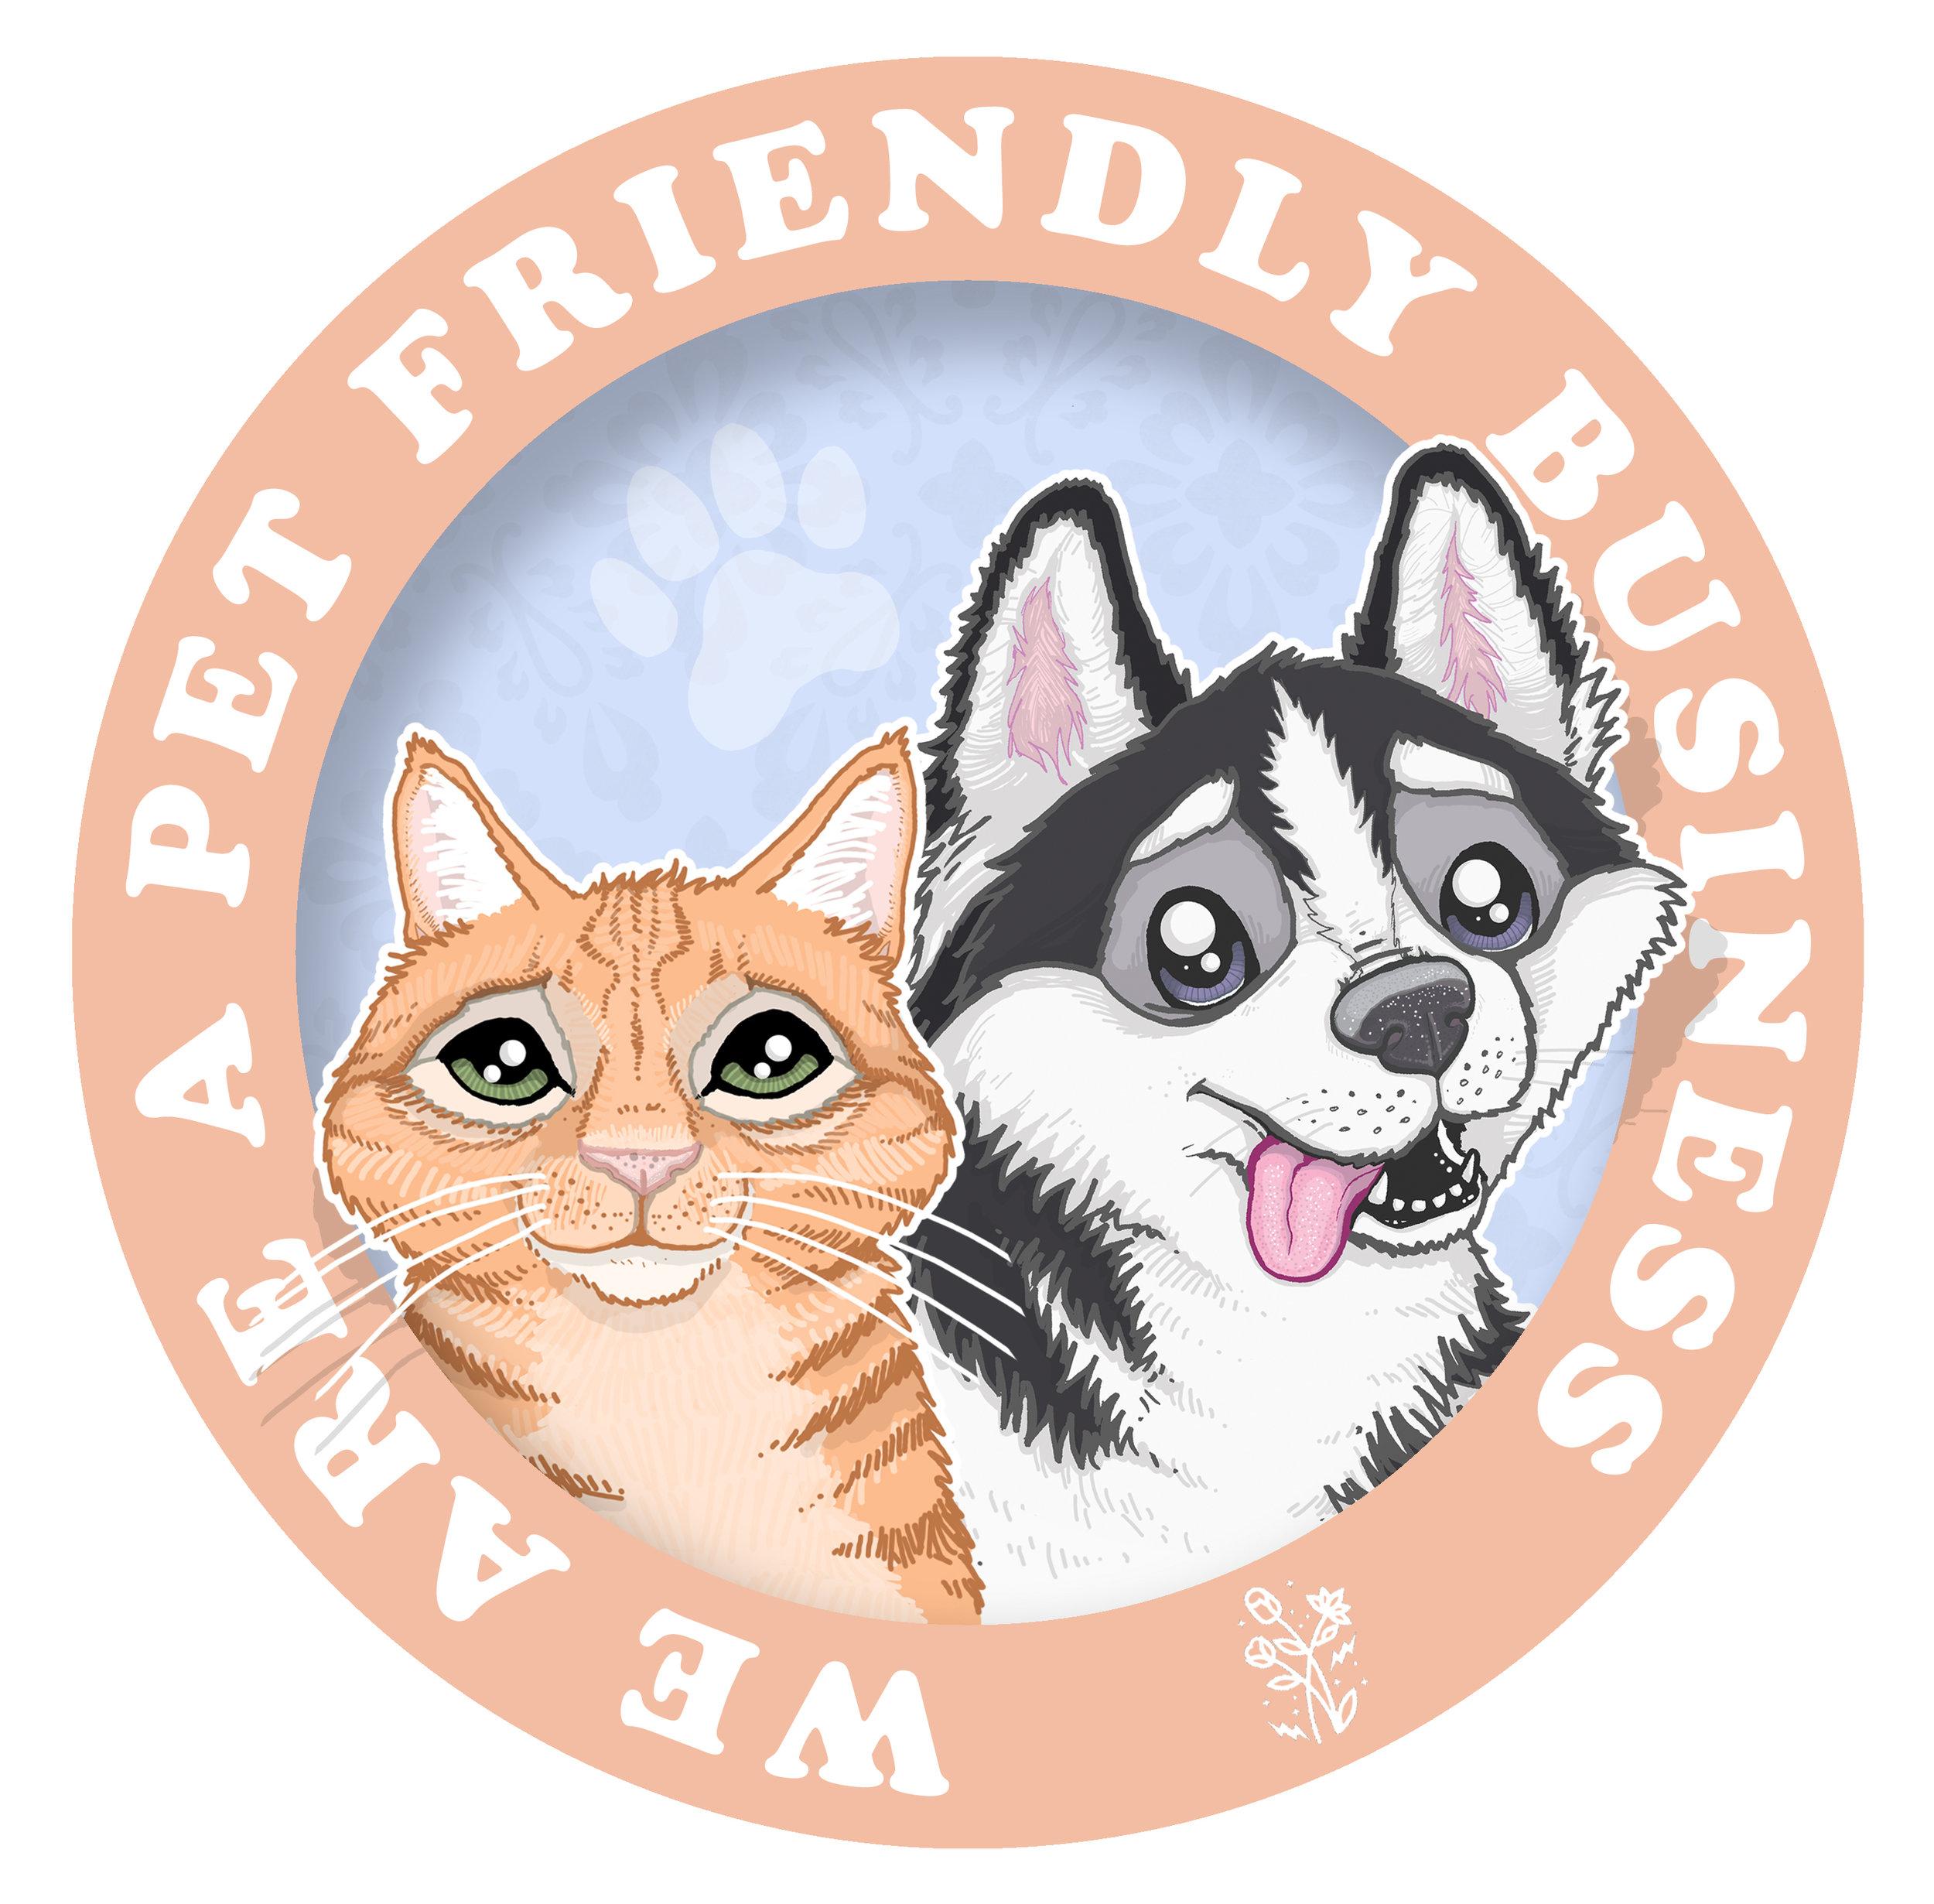 Pet Friendly Business Sticker